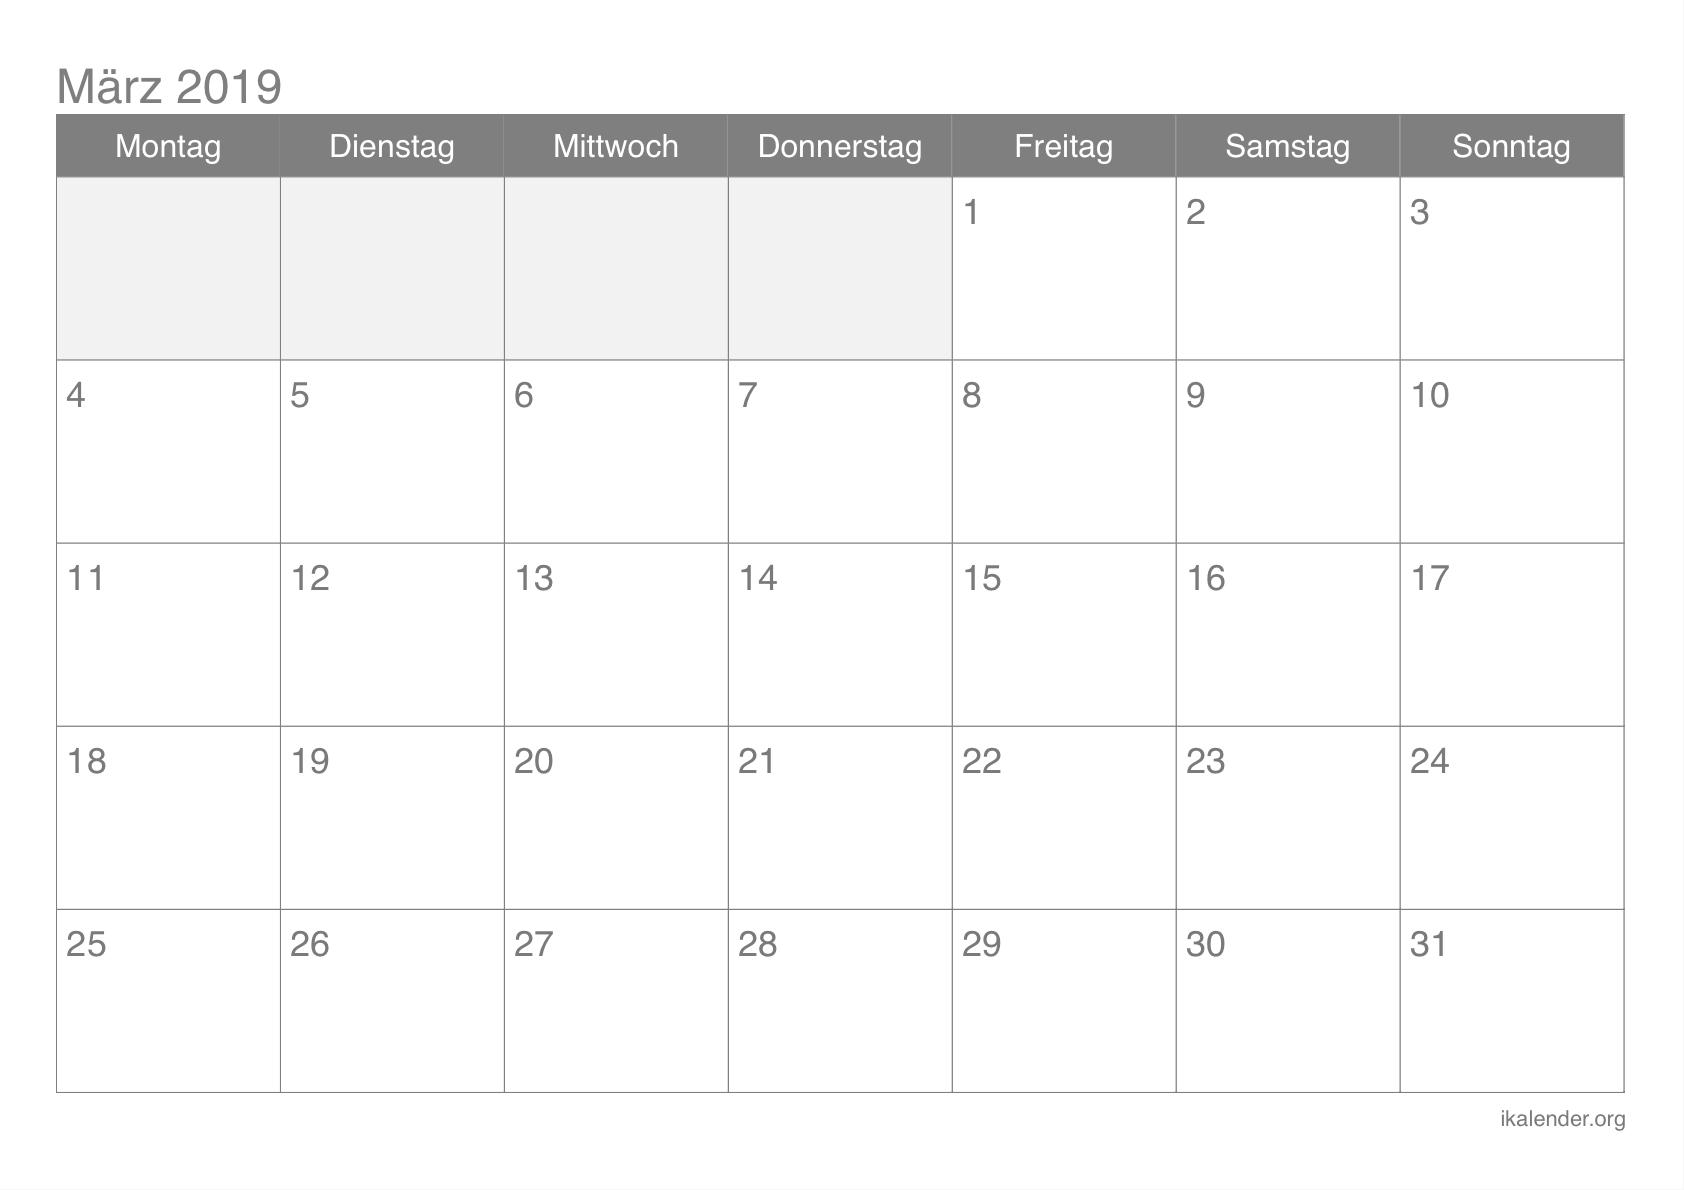 März 2019 Kalender